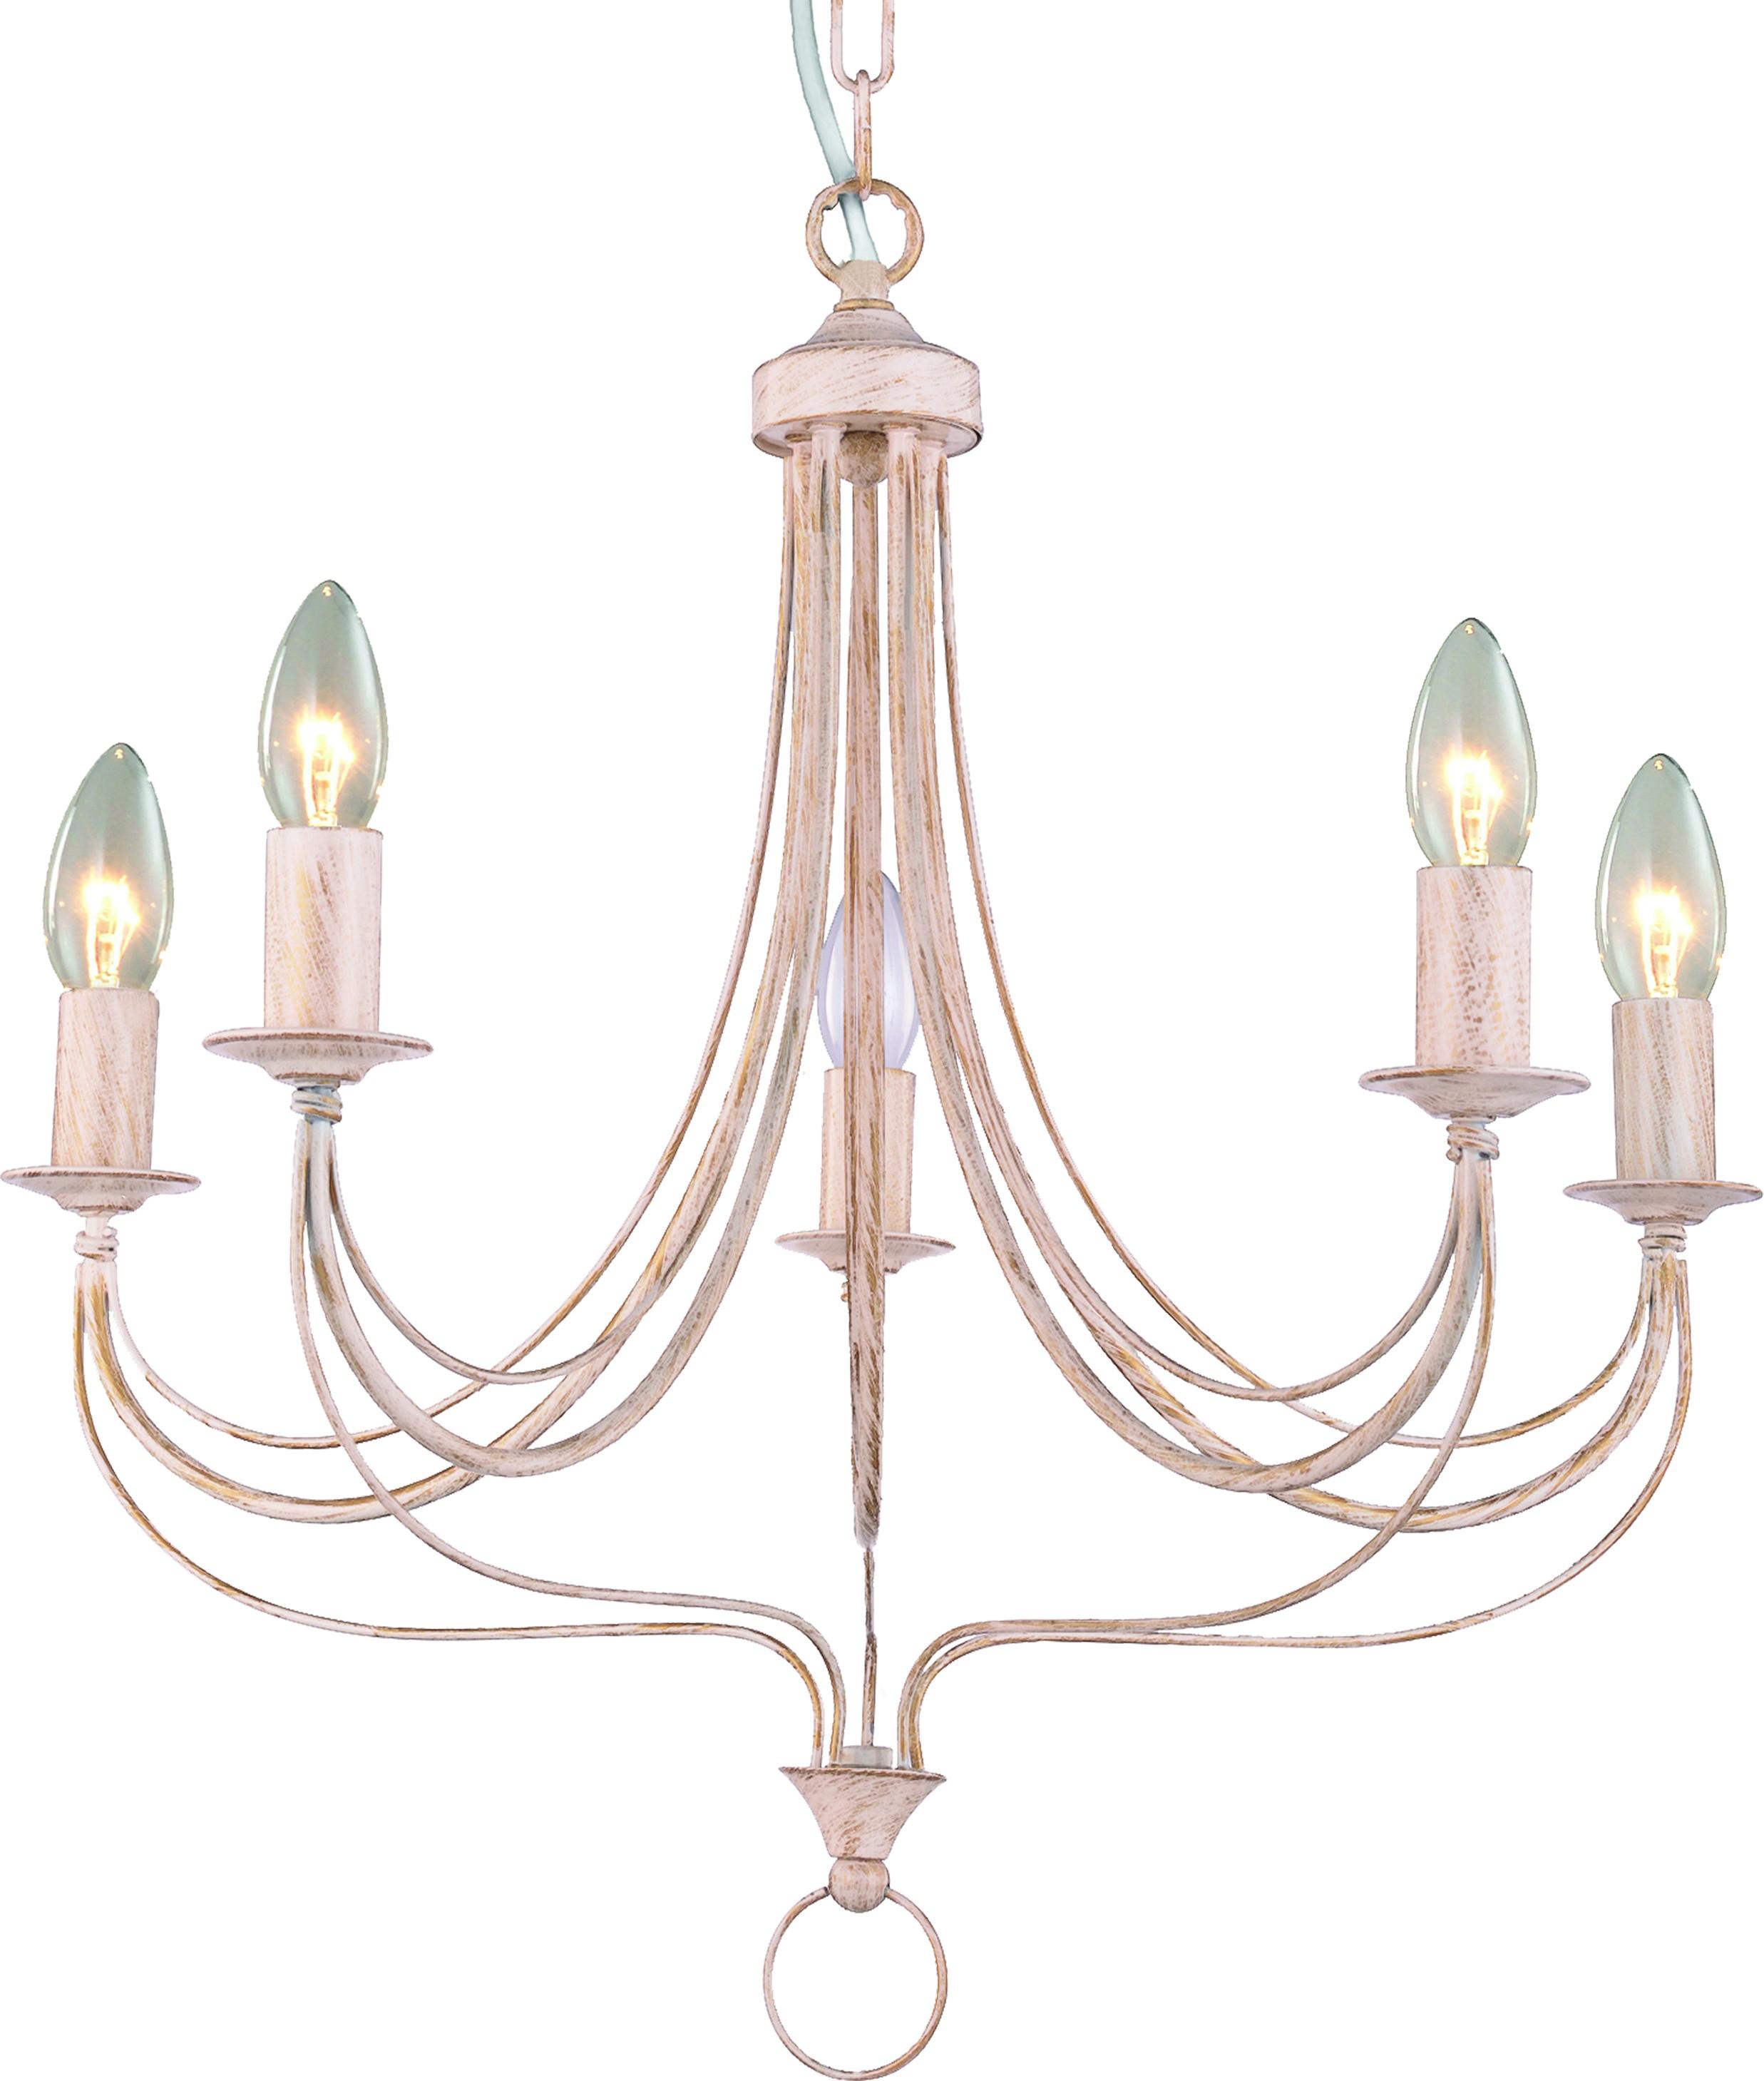 Люстра Arte lamp A6301lm-5wg подвесная люстра mayotte a6301lm 5wg arte lamp 1193816